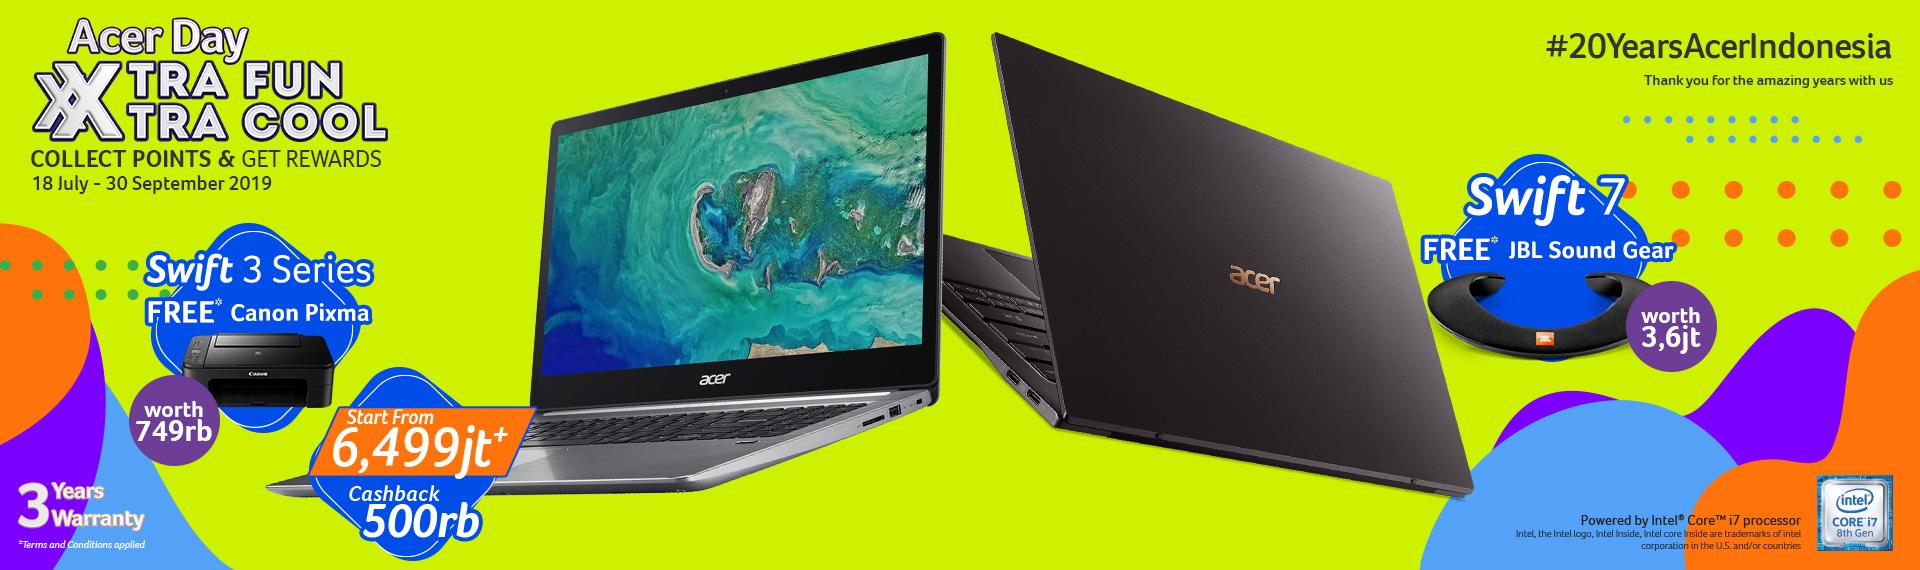 Laptop Tipis Acer Day 2019, Ada Cashback dan Bonus Menarik!